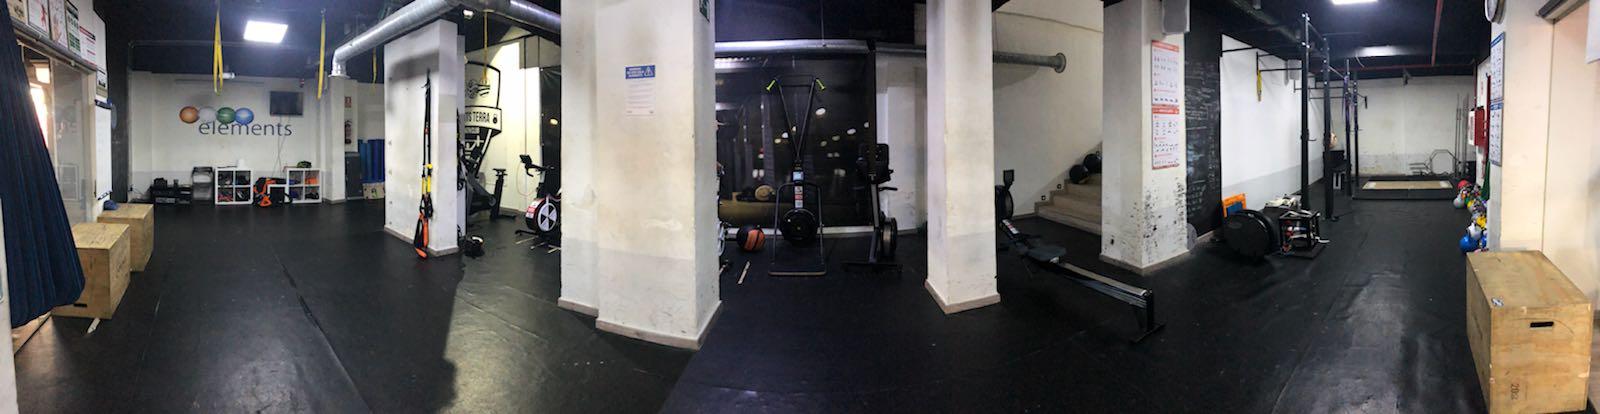 Rebel Gym 3